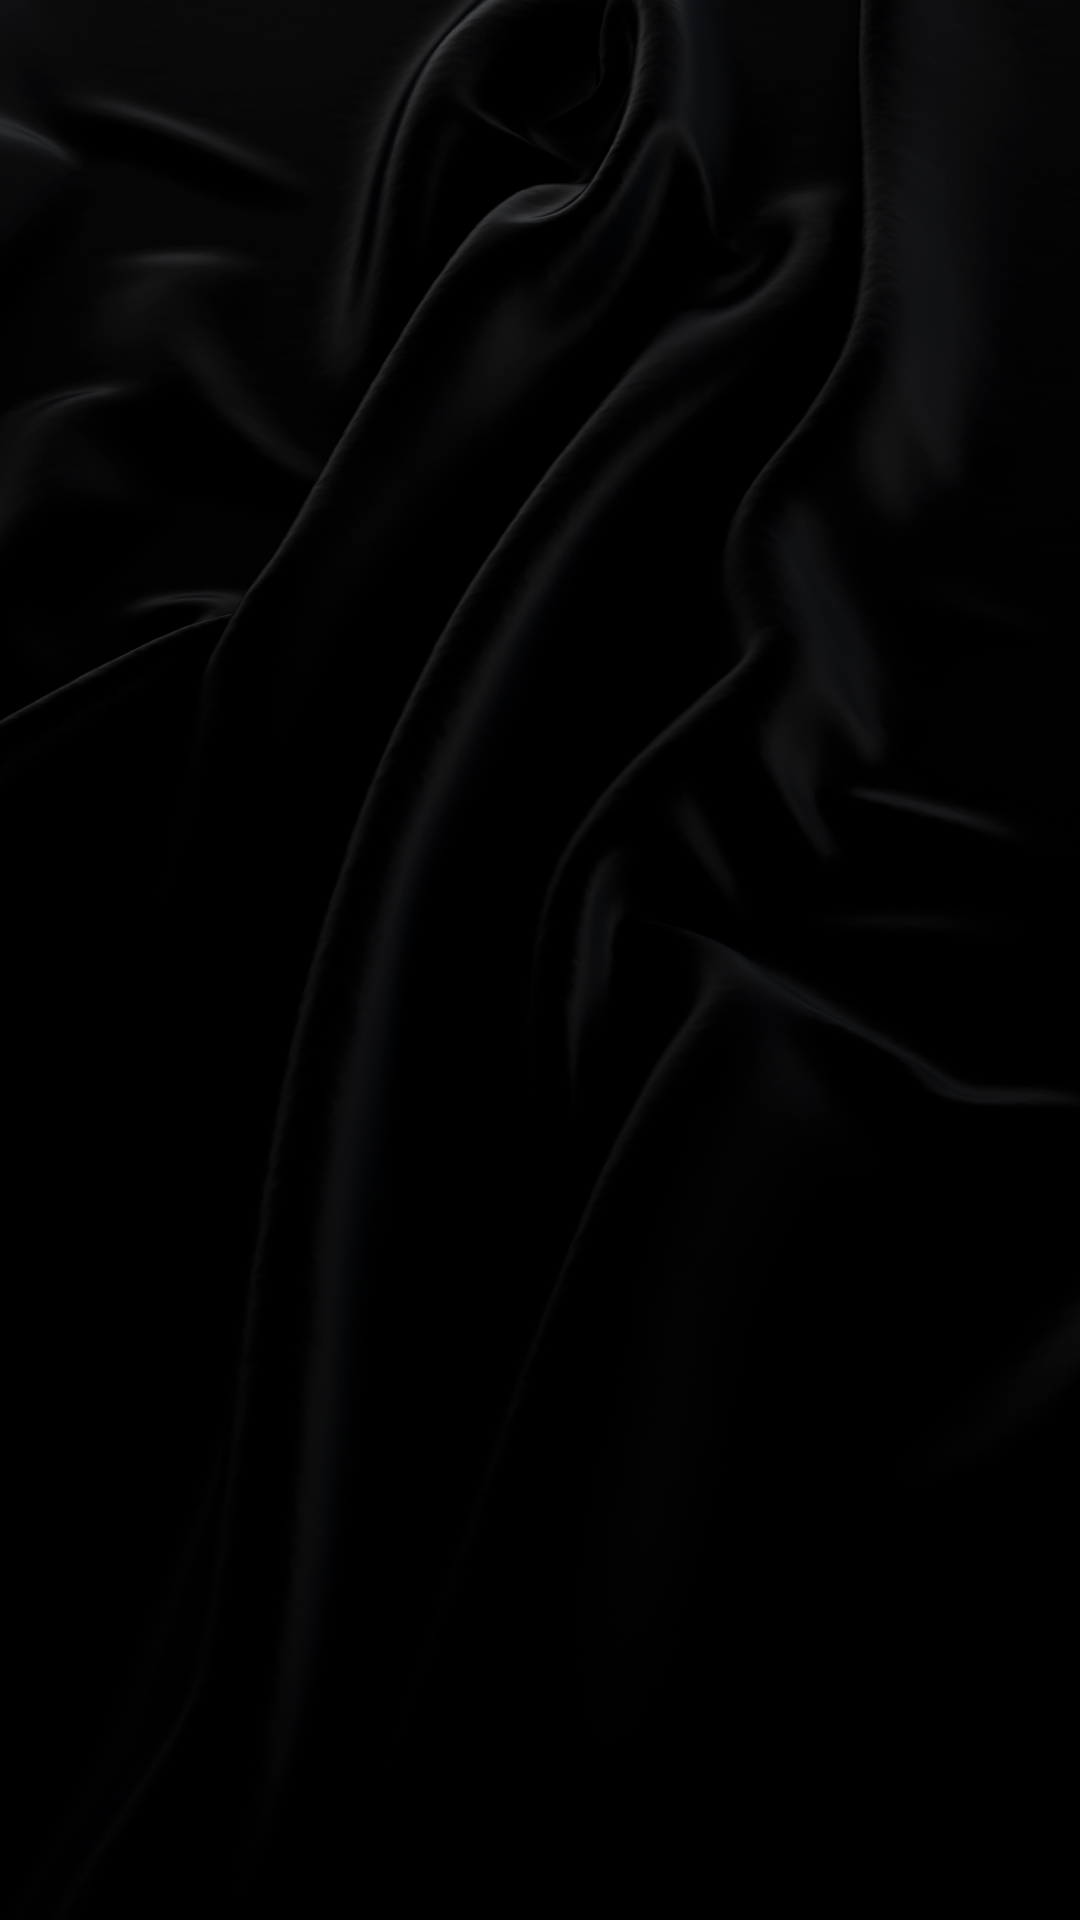 BLACK_X_phone-1